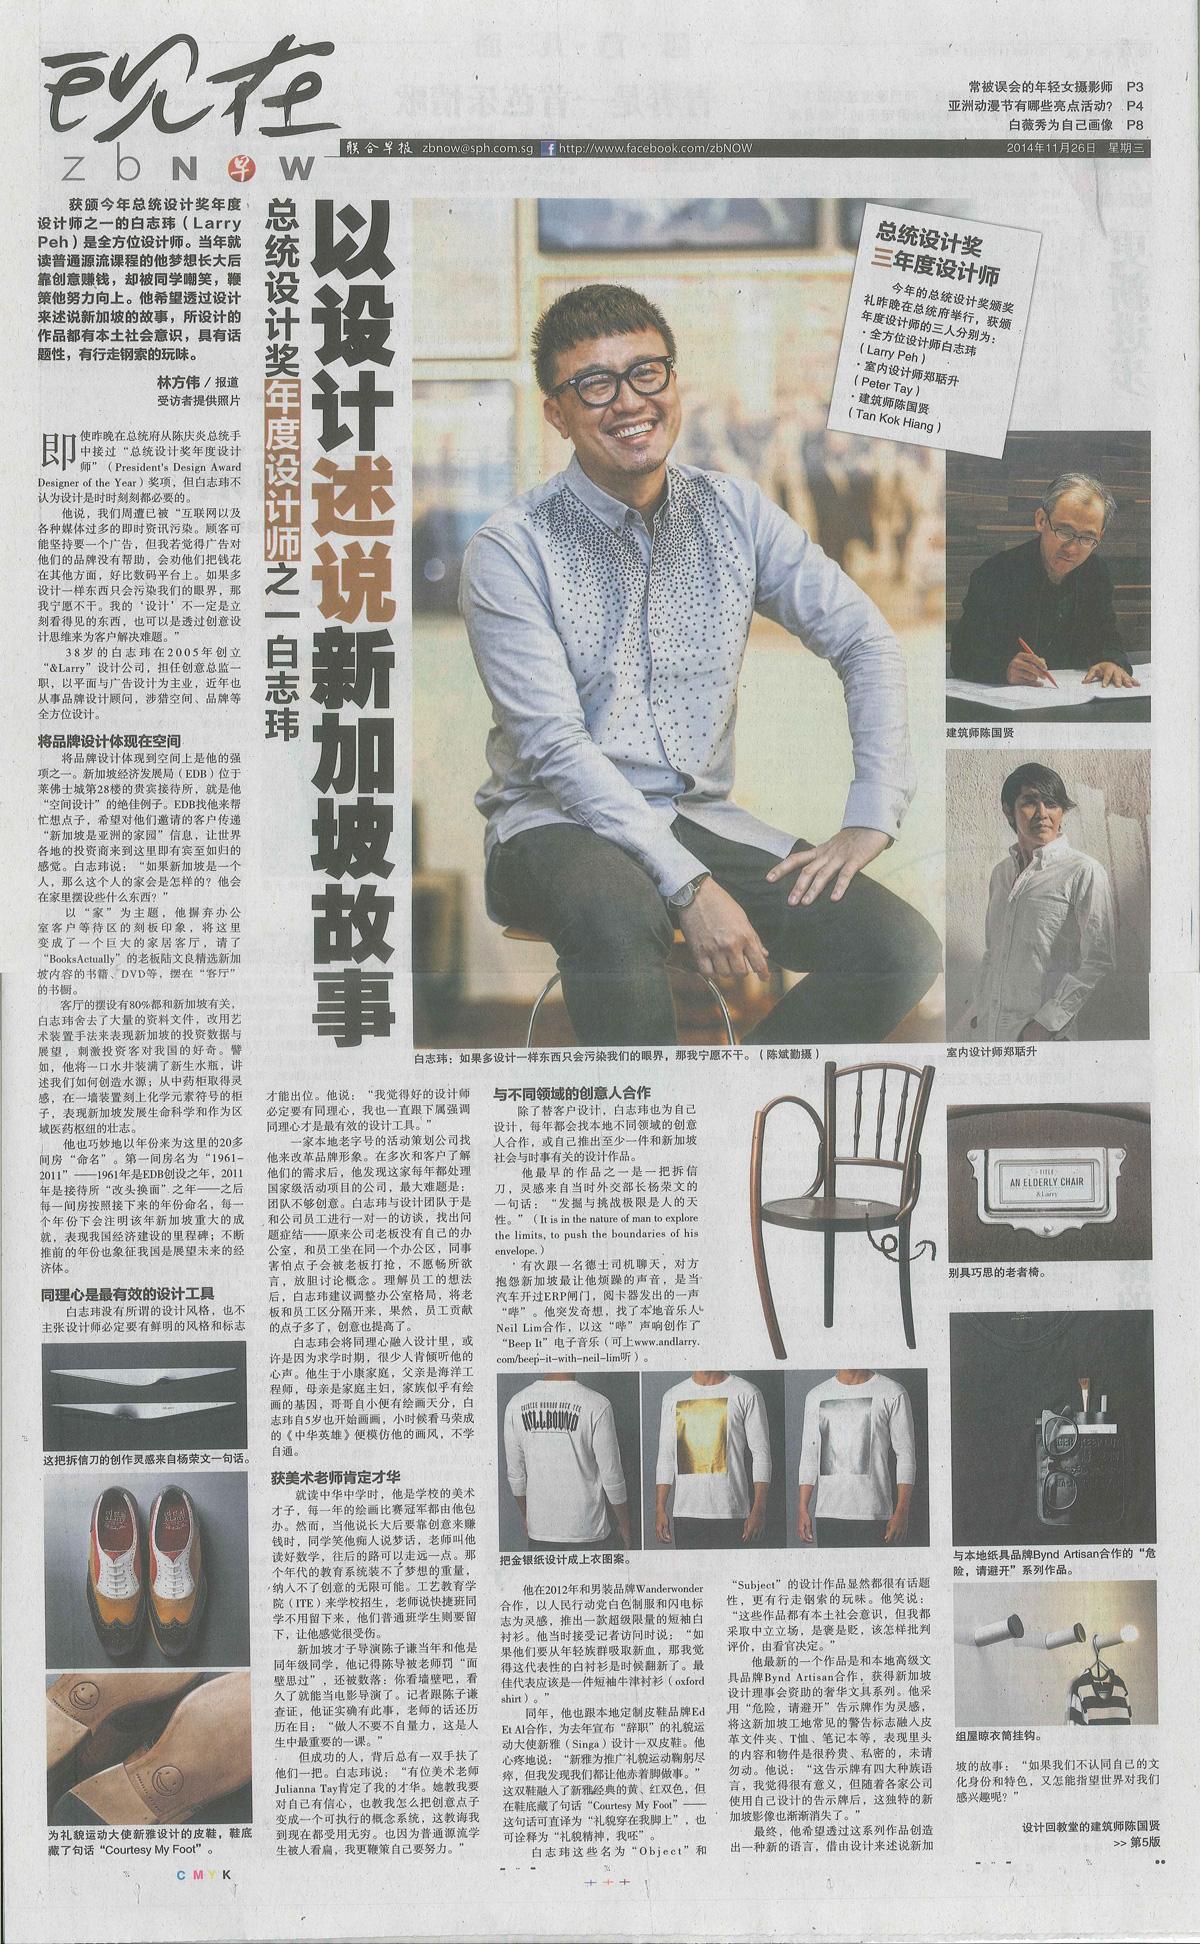 2014, Nov 26 / Zaobao